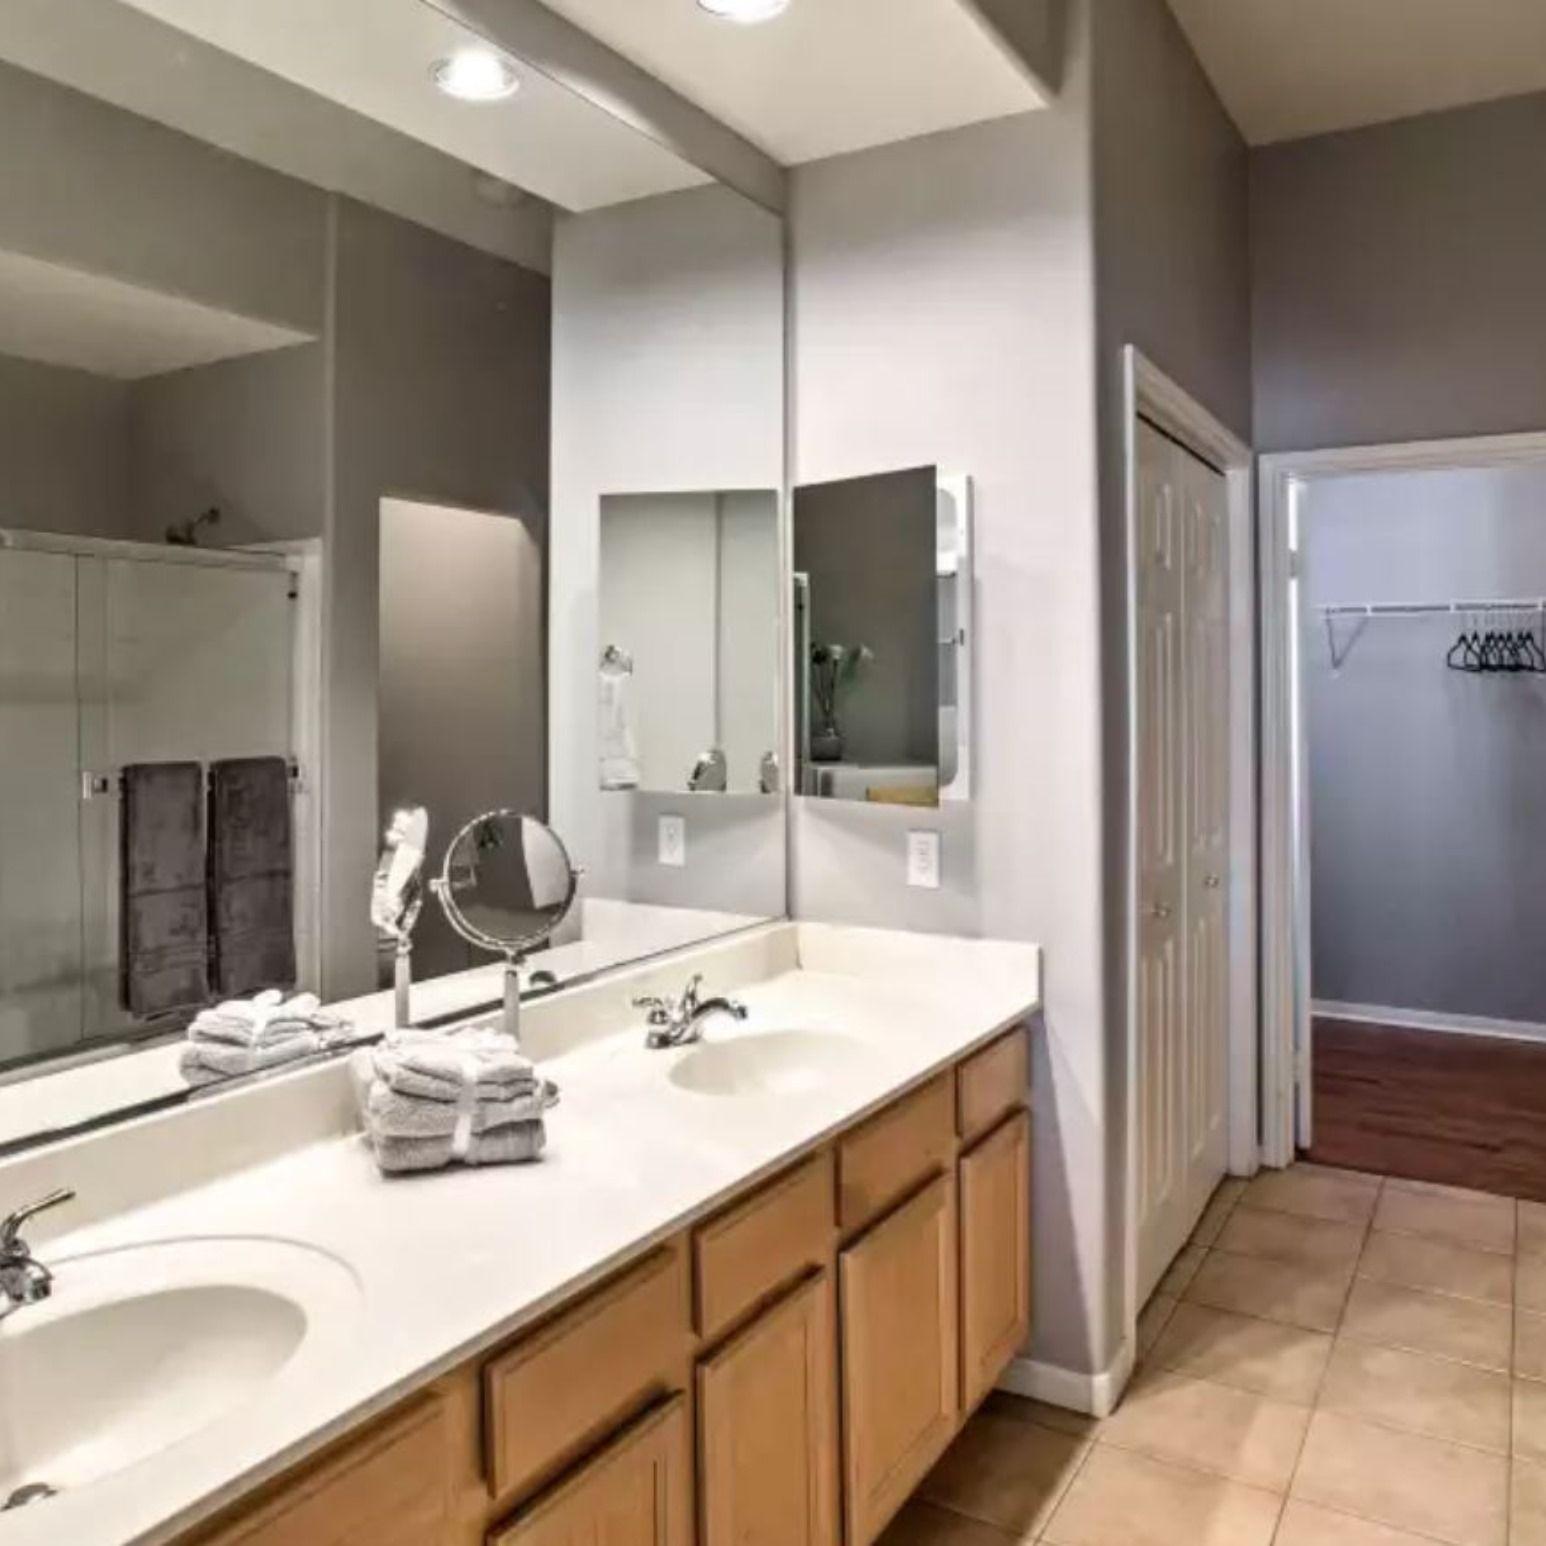 Pin on Scottsdale Real Estate